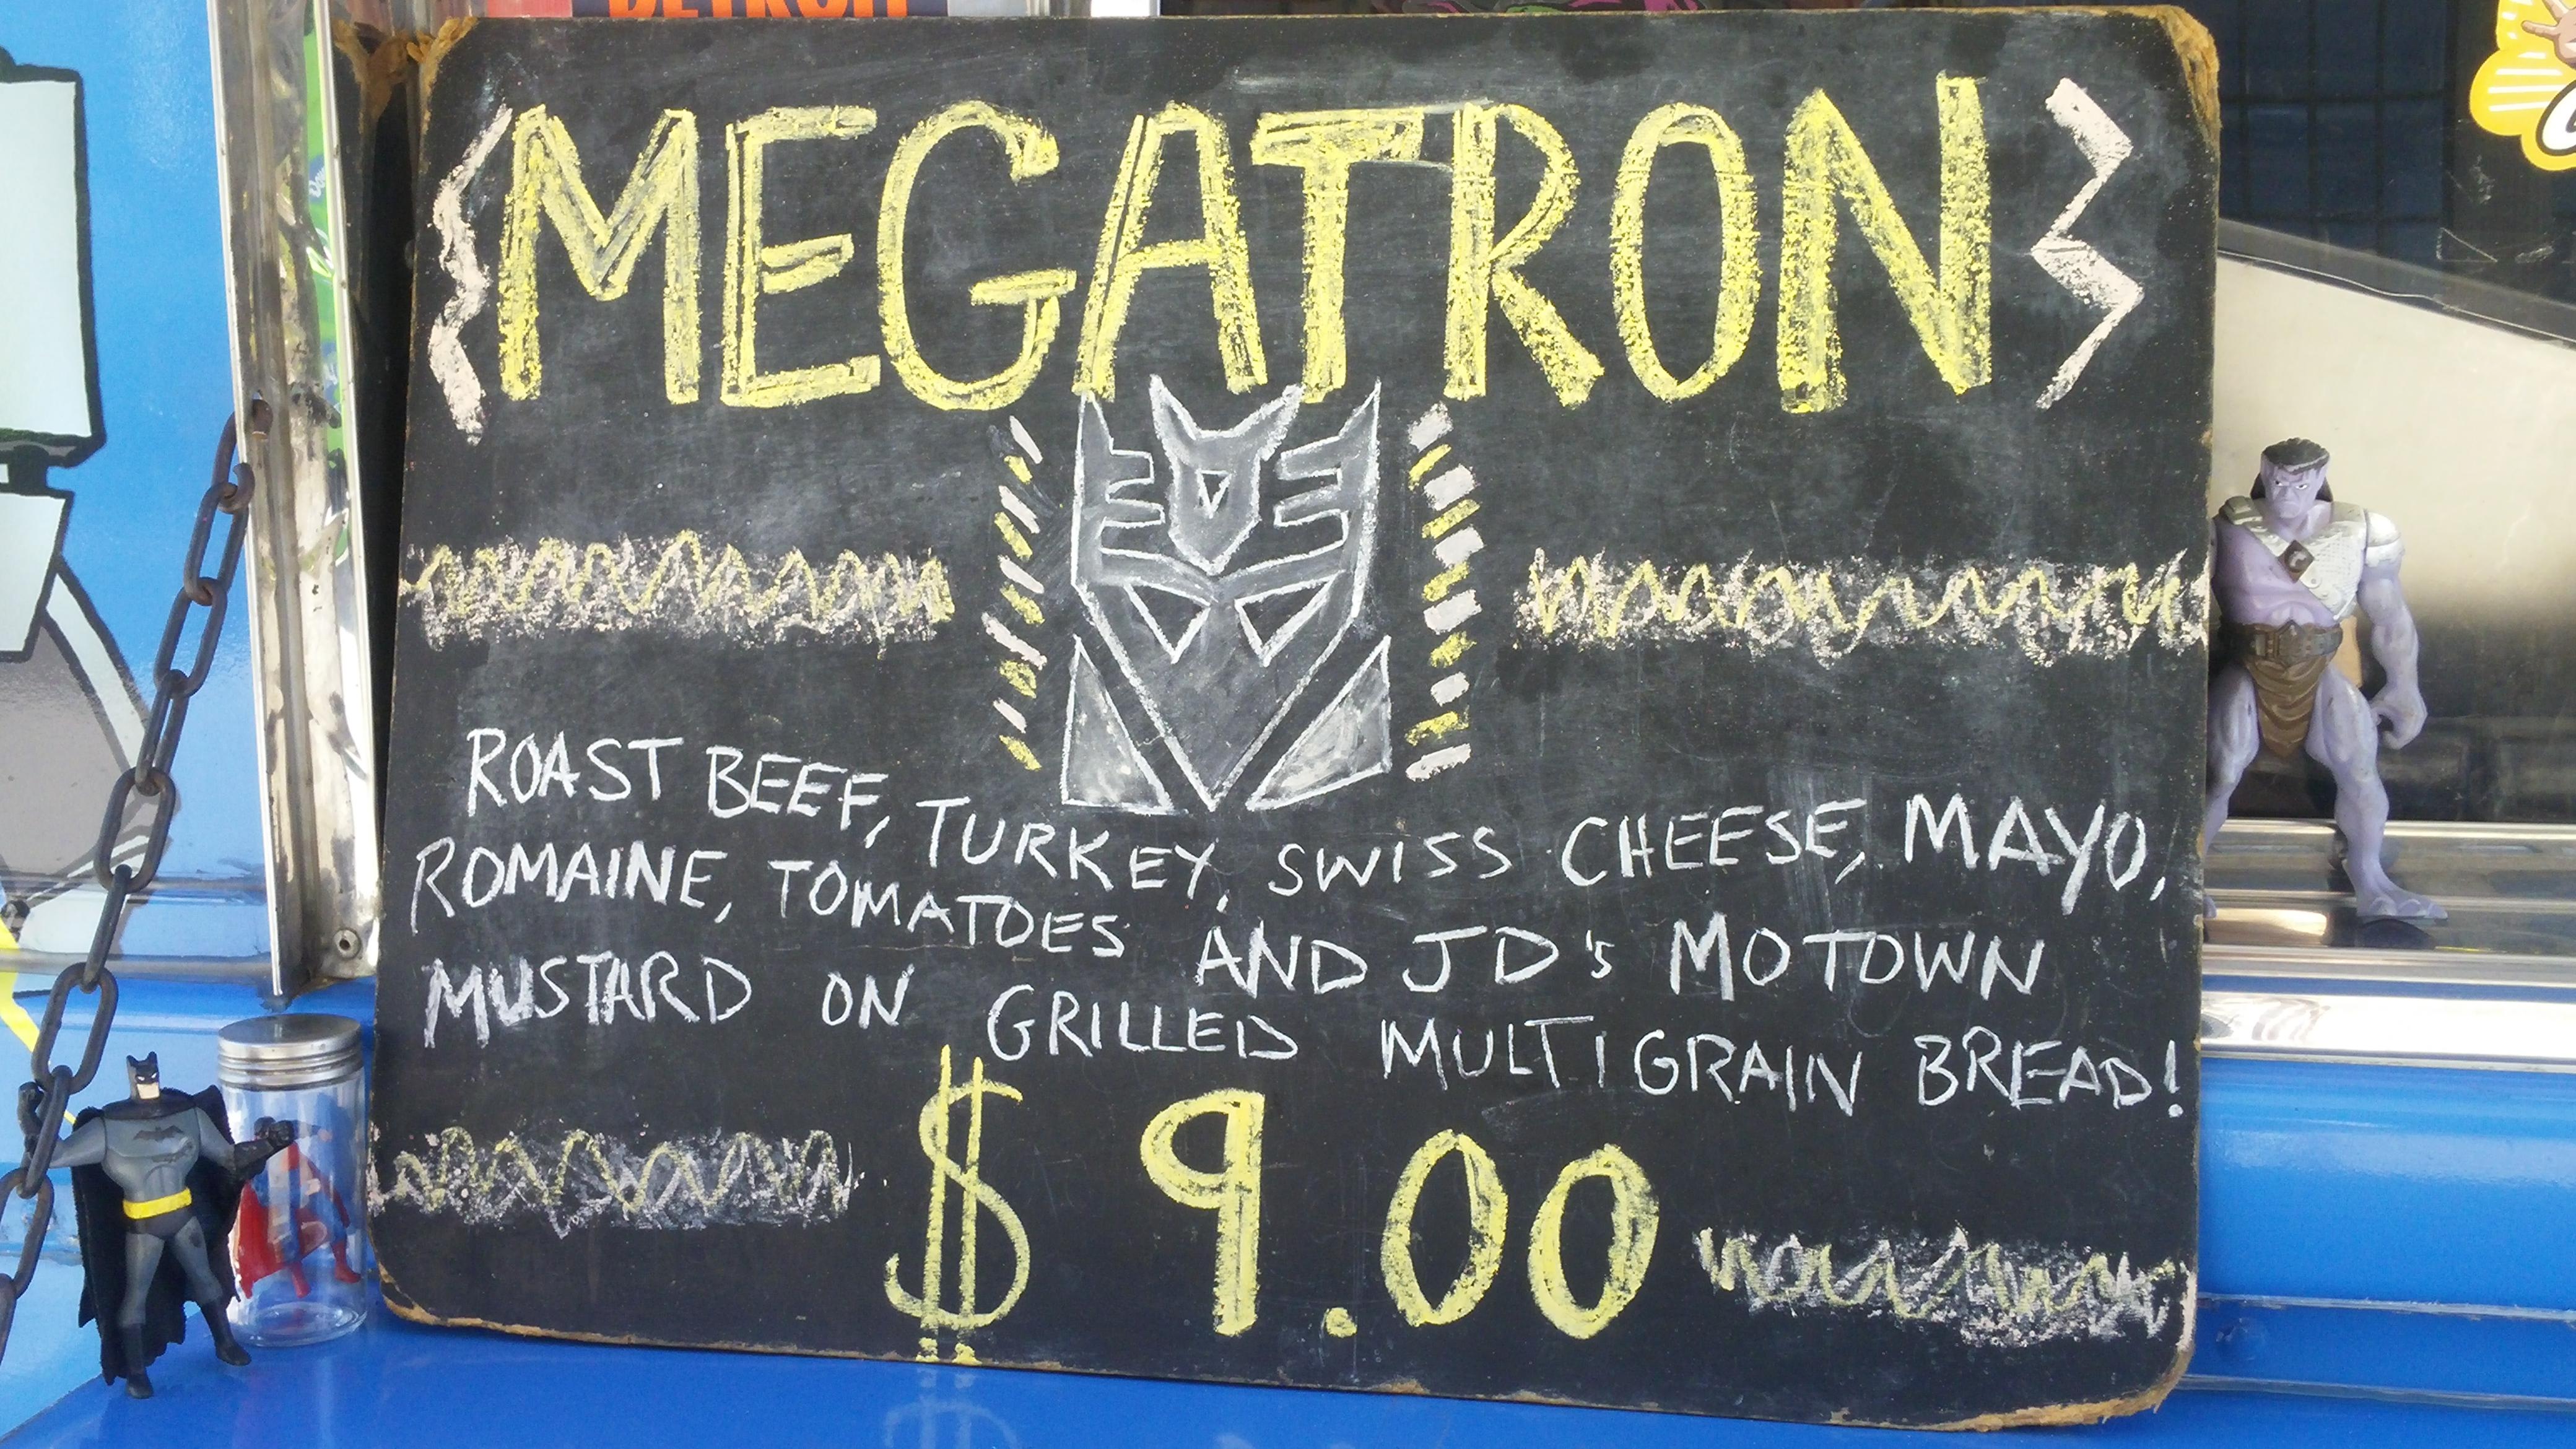 Megatron Special